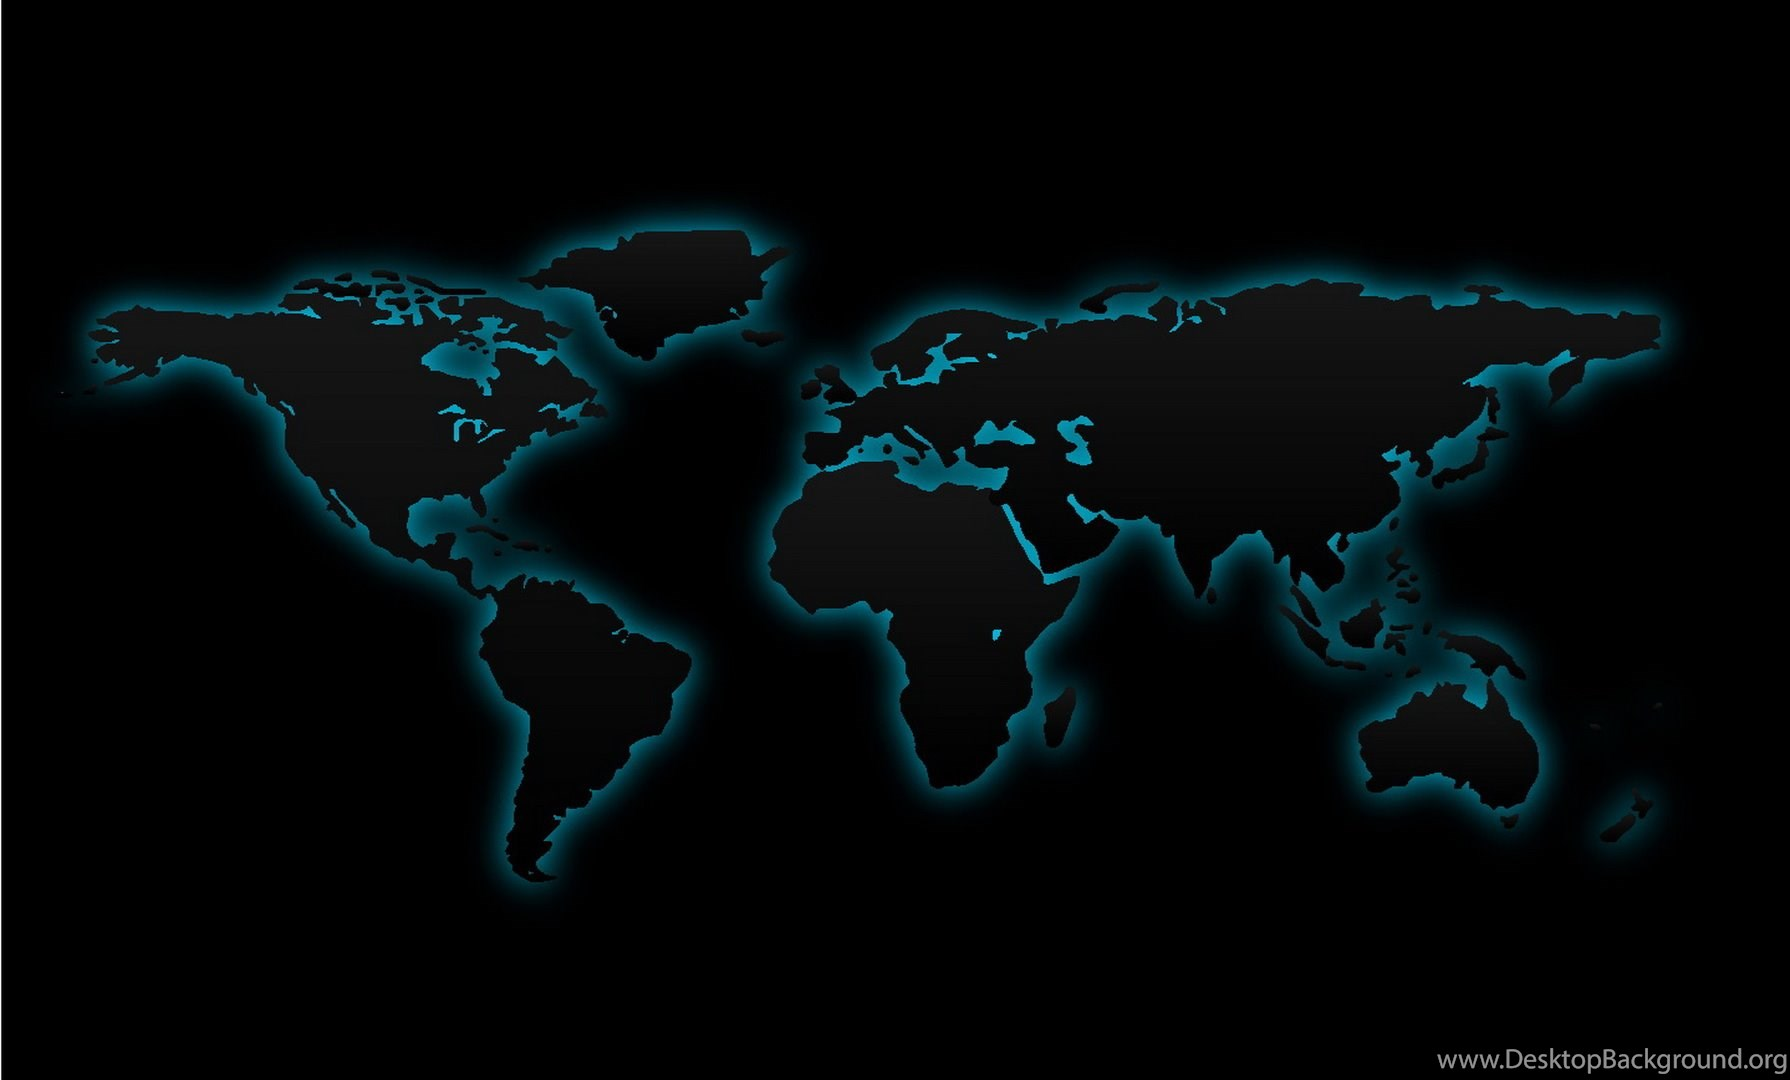 100 world map desktop wallpaper computer digital world map w red world map wallpaper free wallpaper download gallery gumiabroncs Image collections